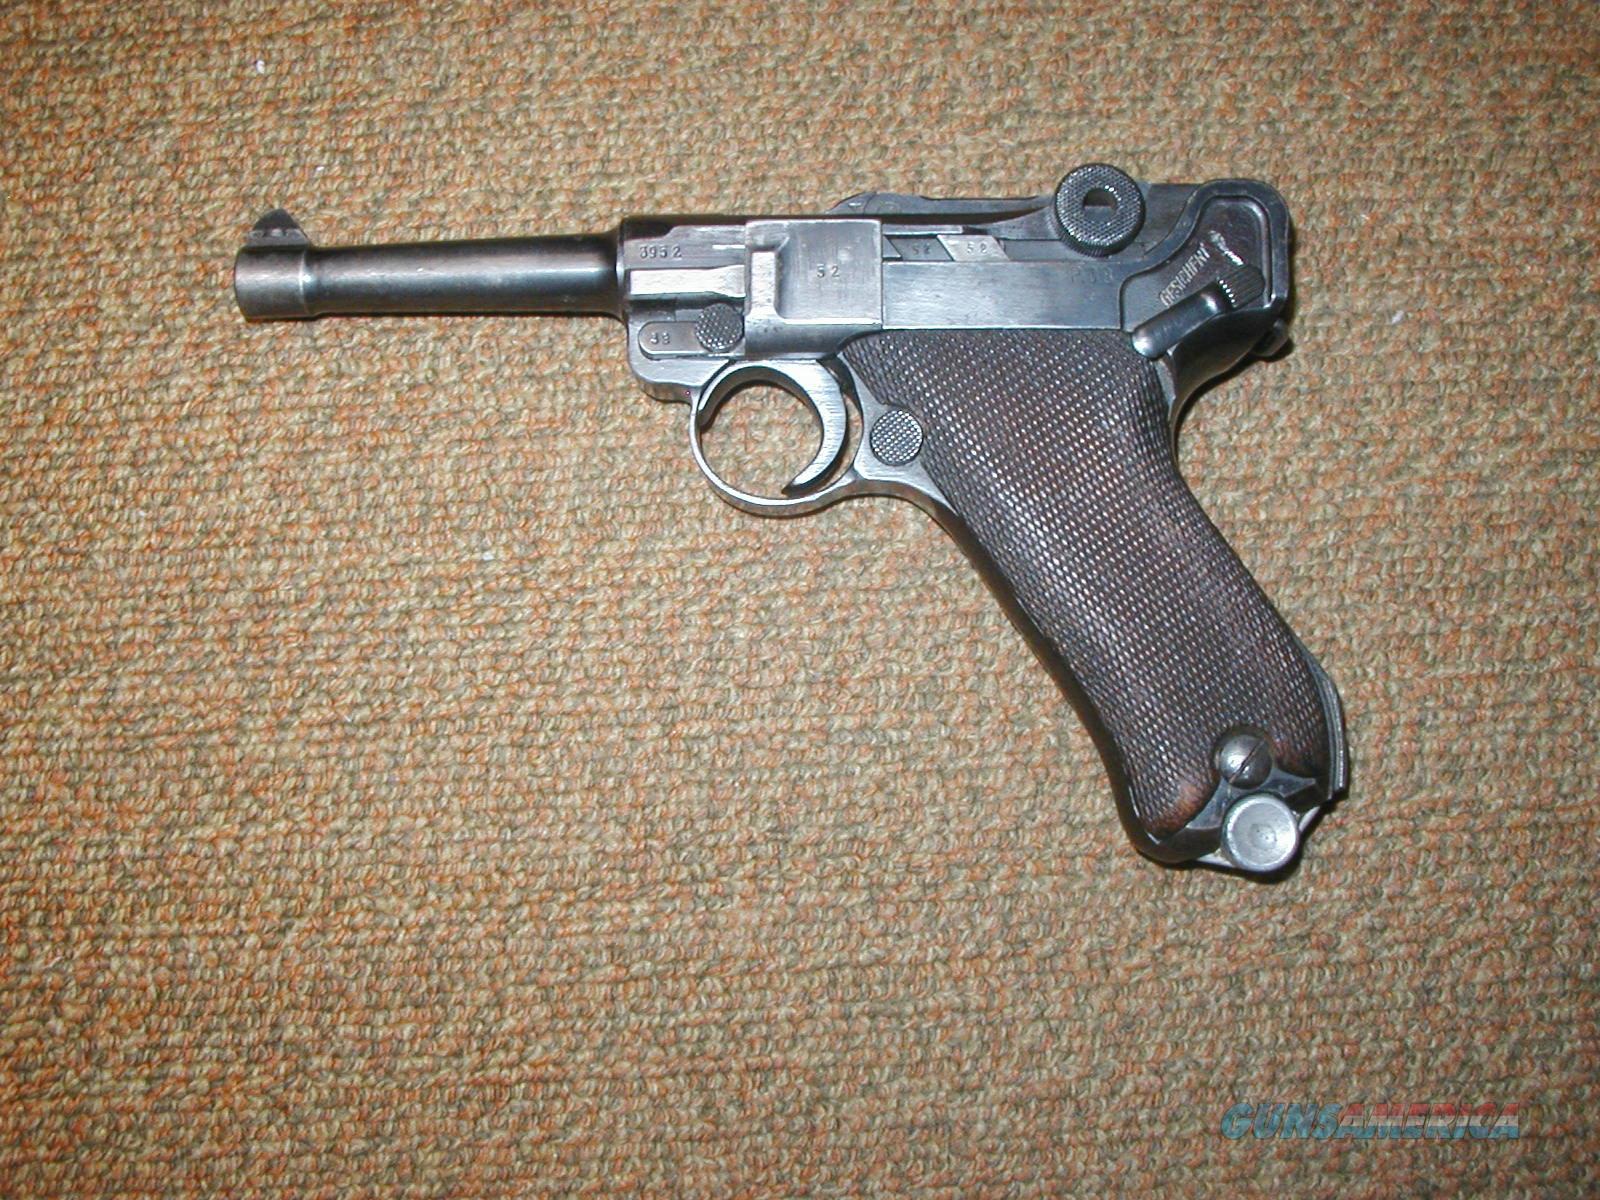 MAUSER LUGER  Guns > Pistols > Mauser Pistols